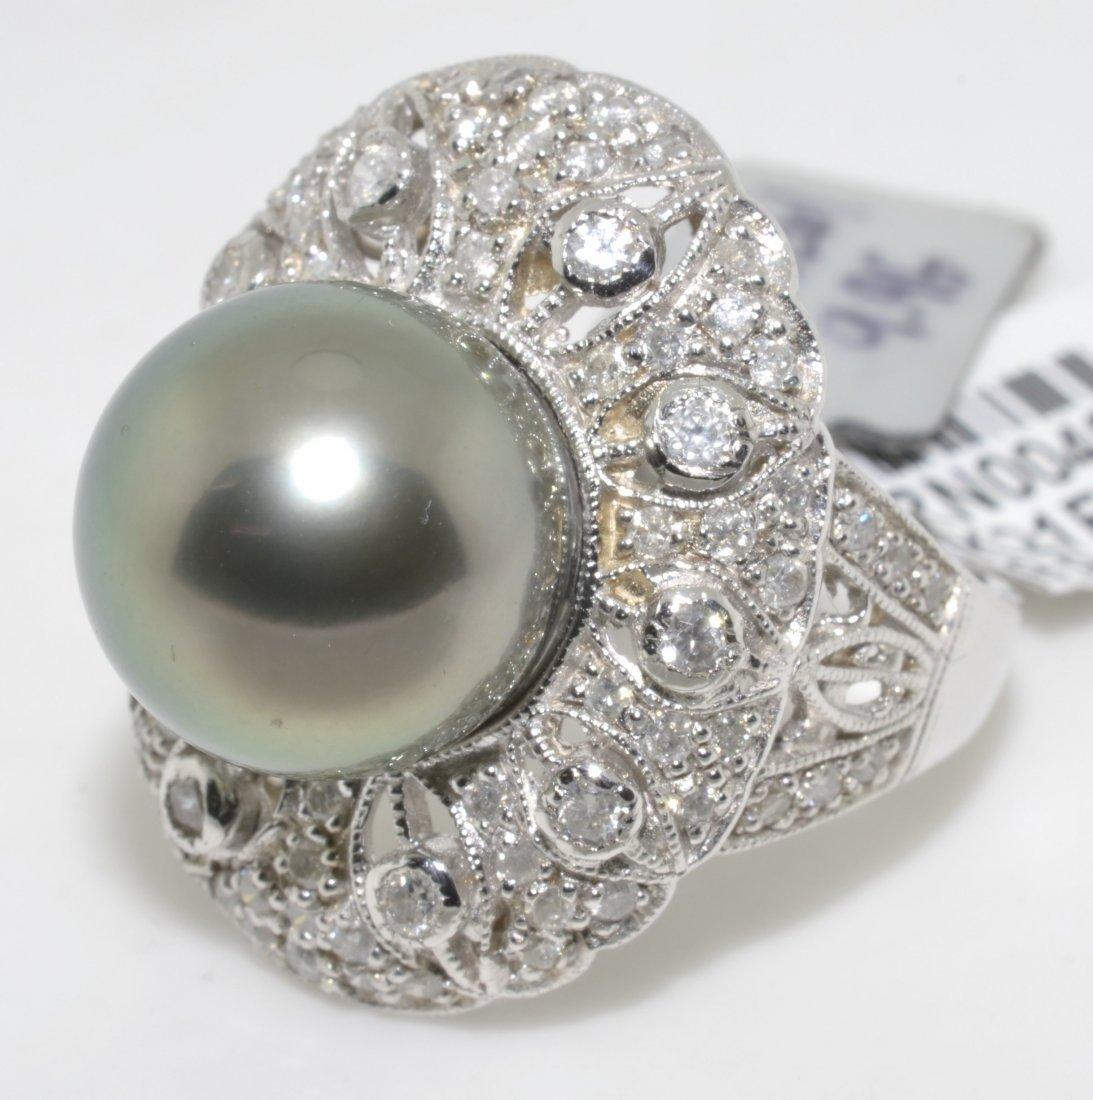 Tahitian Pearl & Diamond Ring Appraised Value: $5,570